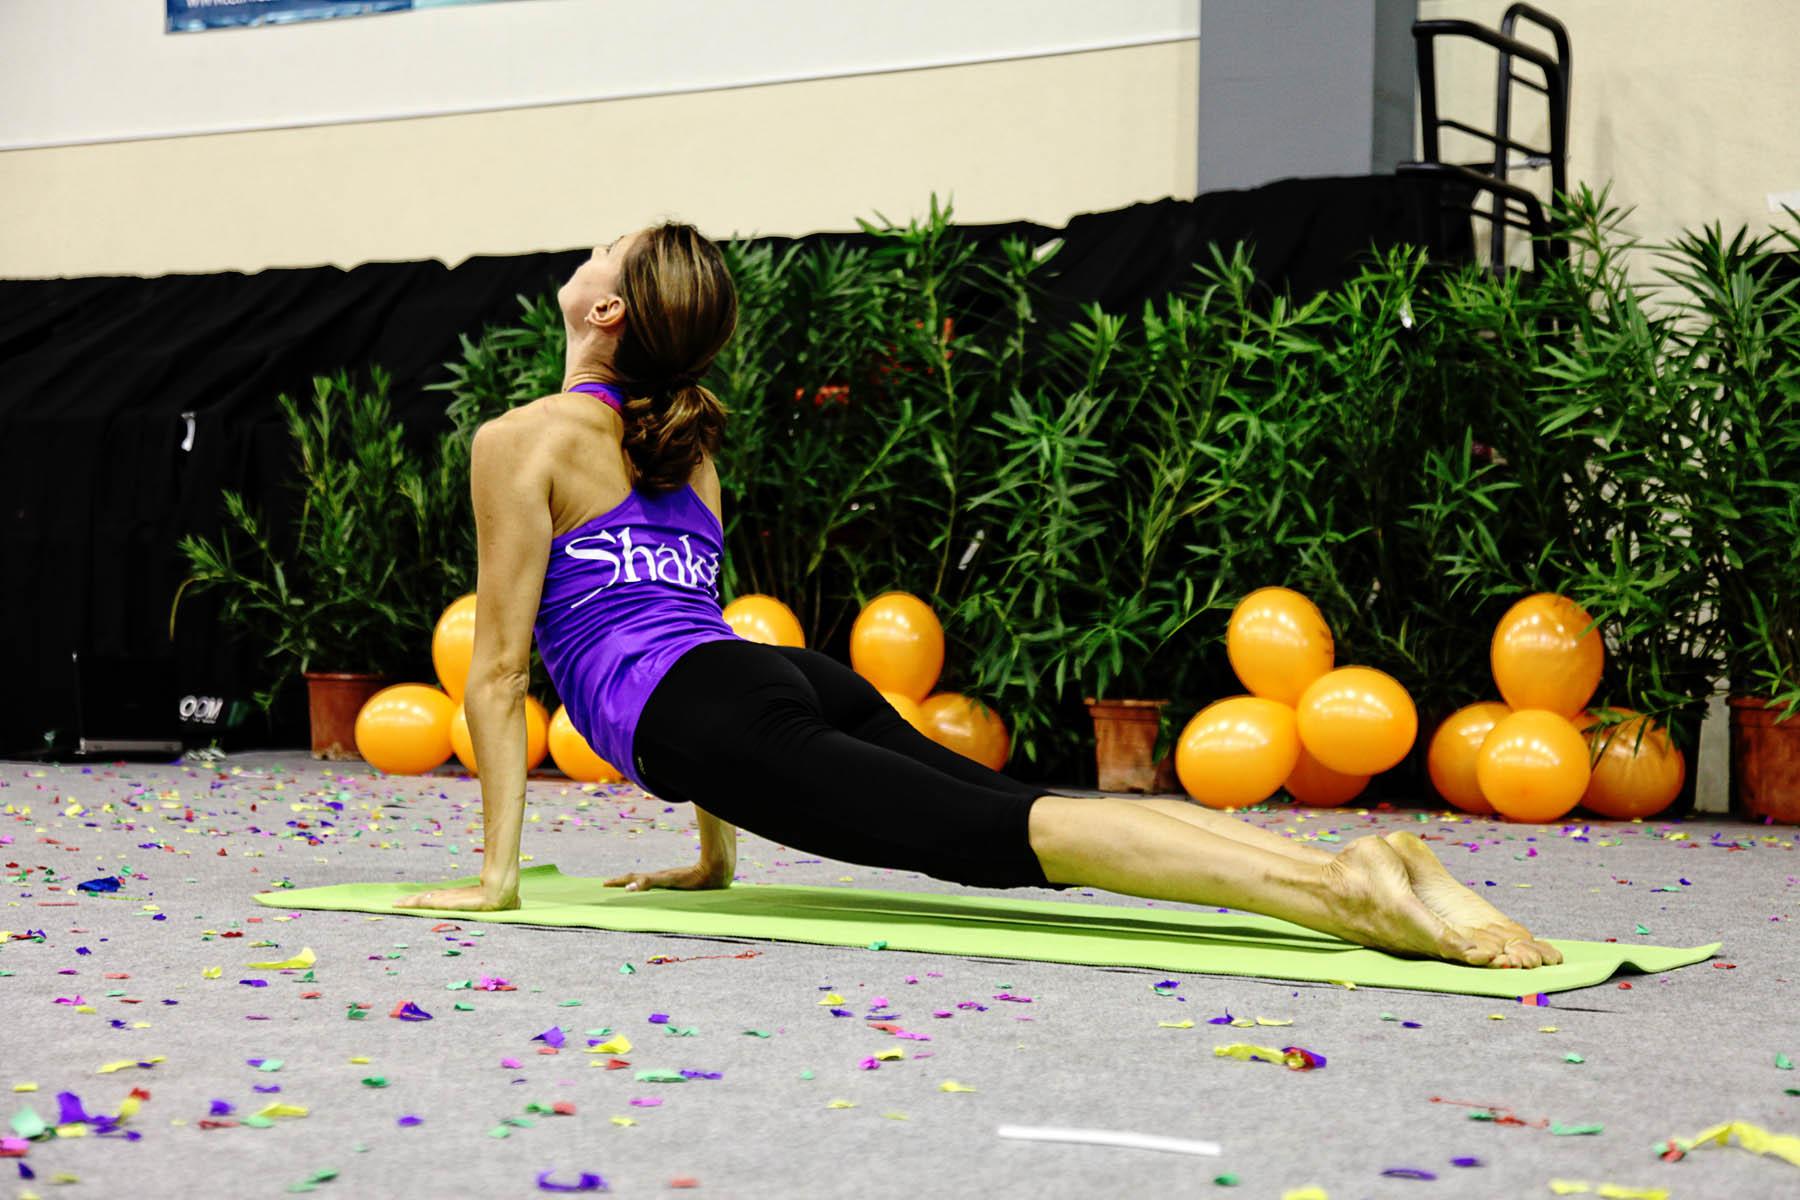 shakti yoga masage martial arts dance thai restaurant albir benidorm altea lanucia calpe alfas 20